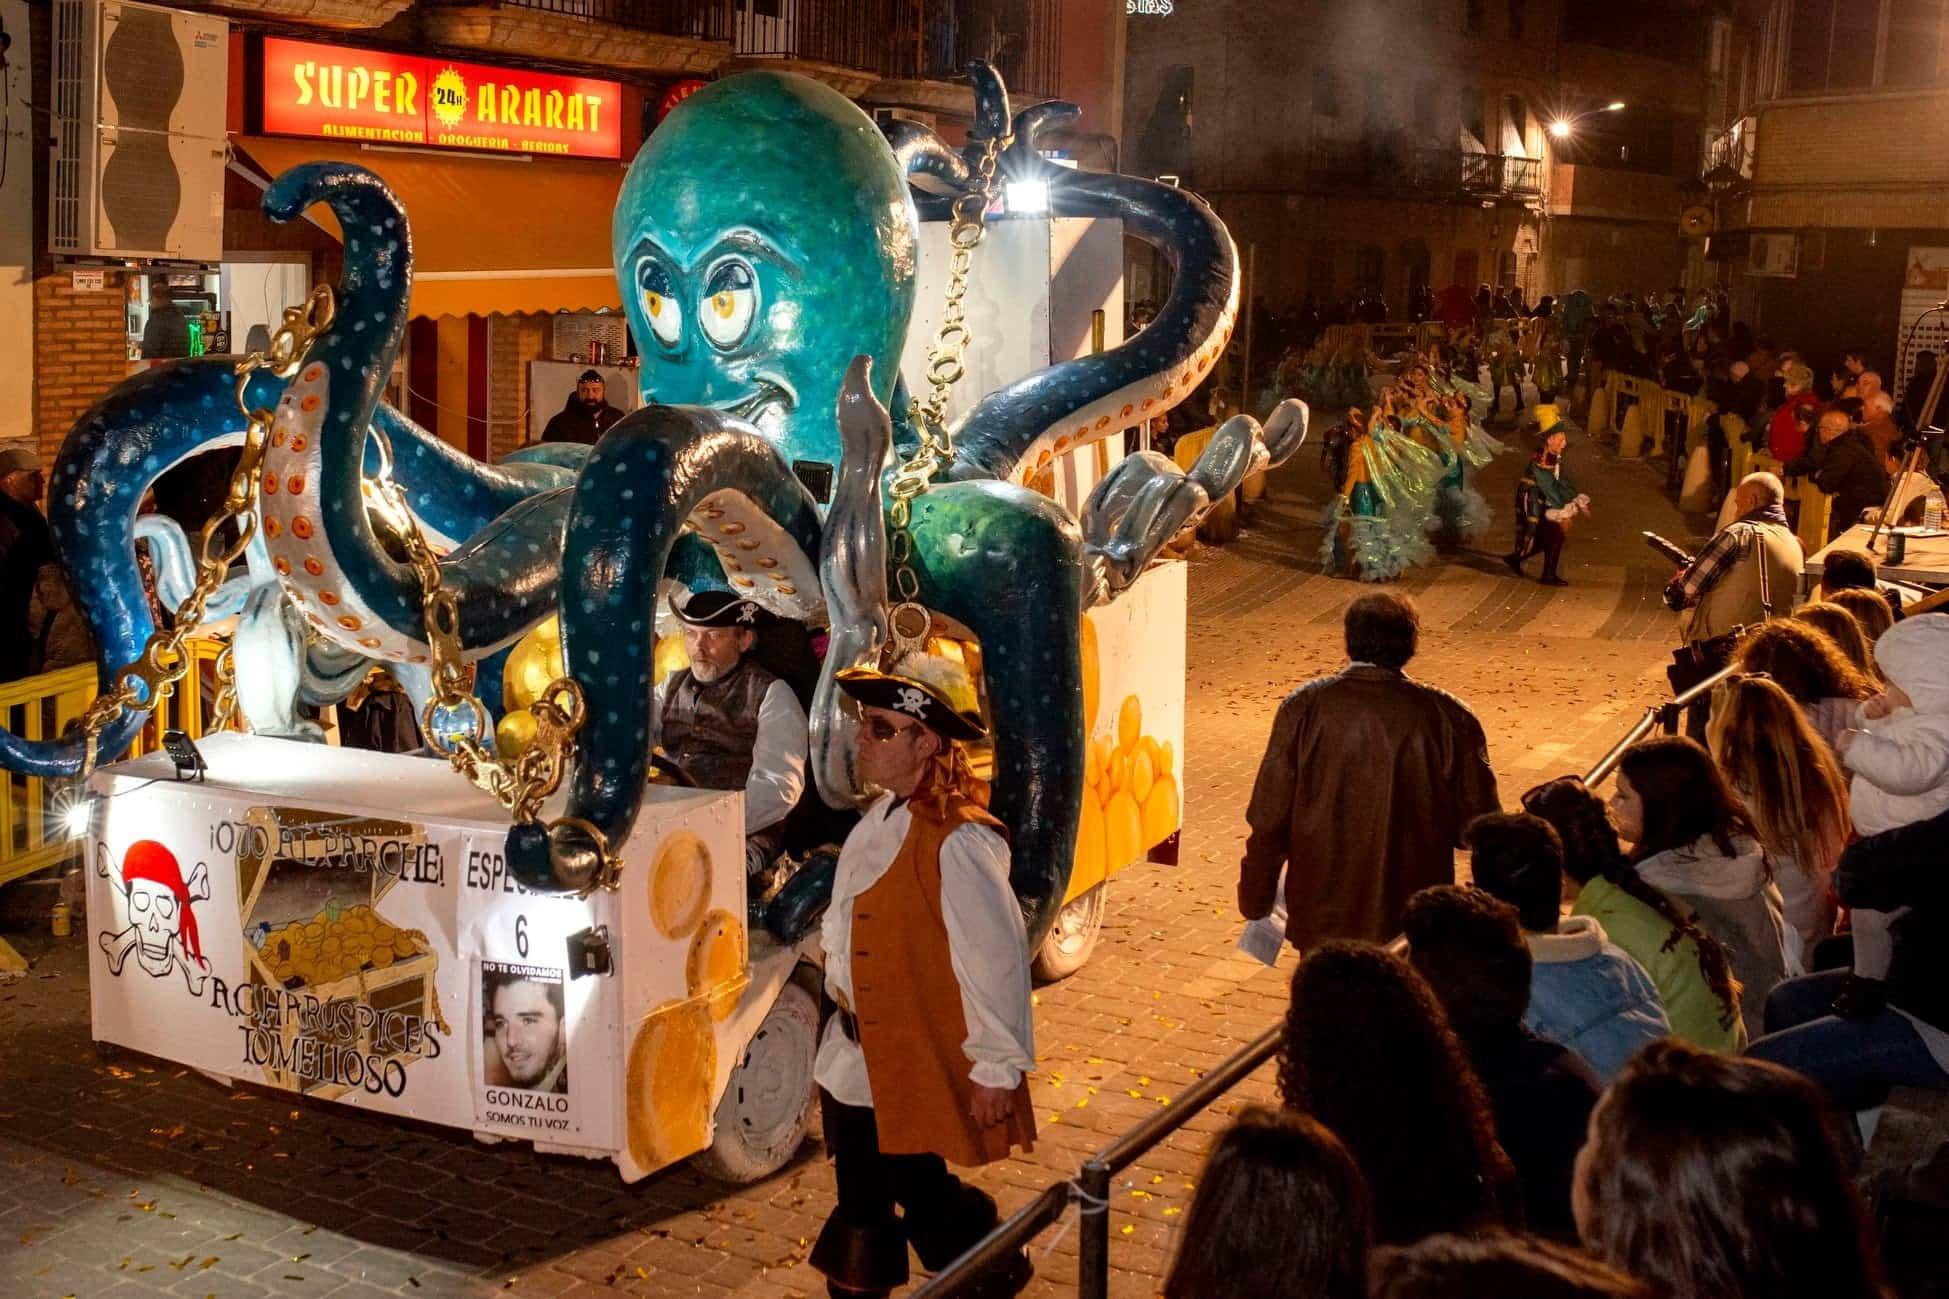 Carnaval de herencia 2020 ofertorio 3 - Selección de fotografías del Ofertorio del Carnaval de Herencia